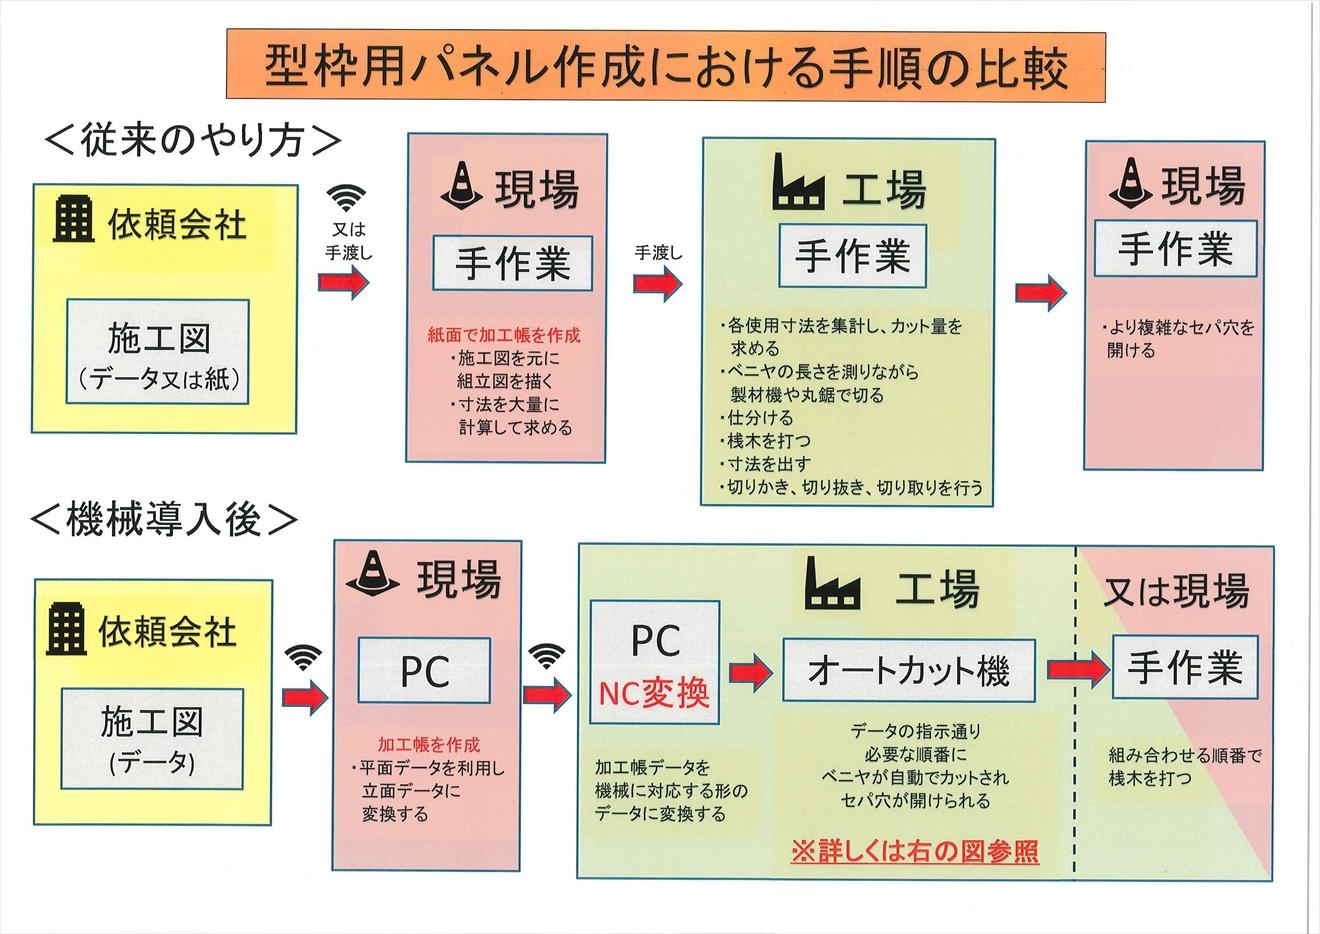 http://www.nk-nakafusa.co.jp/20170915110804629_0002_R.jpg